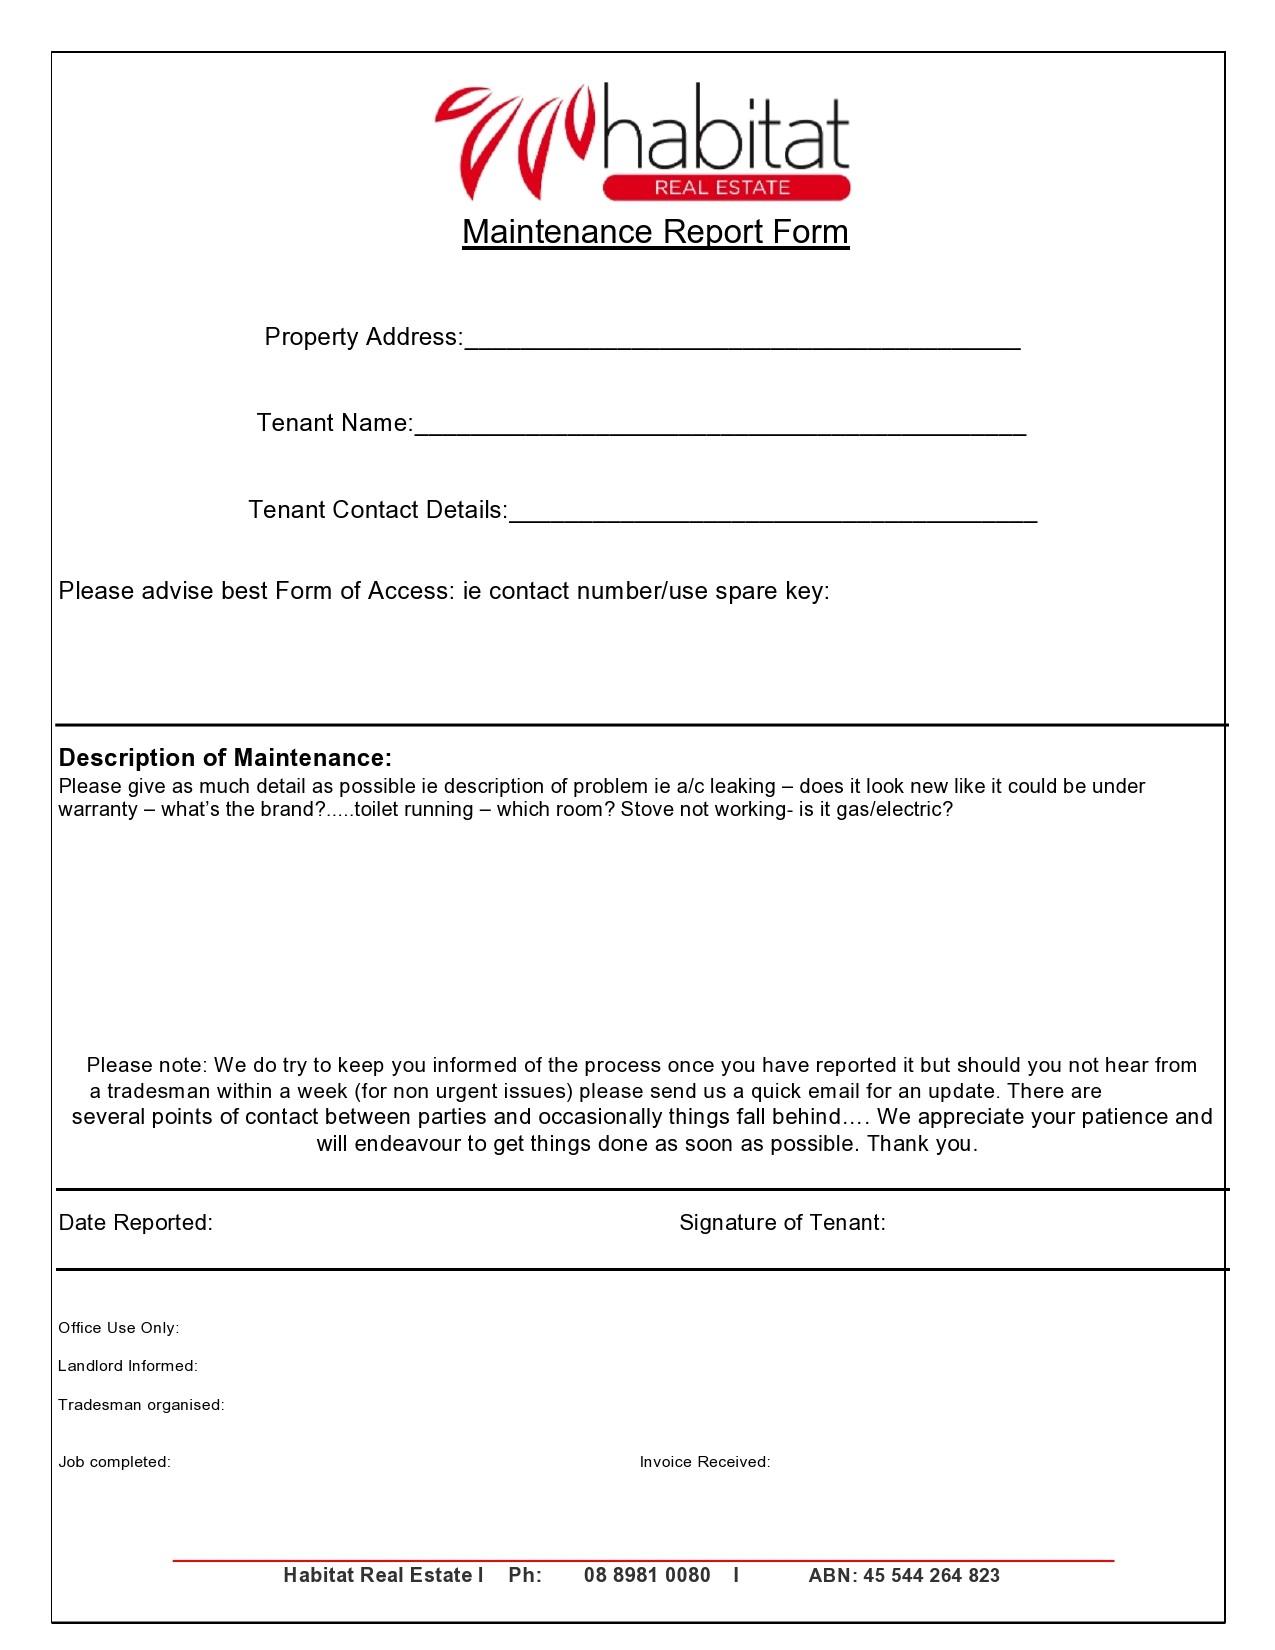 Free maintenance report form 16